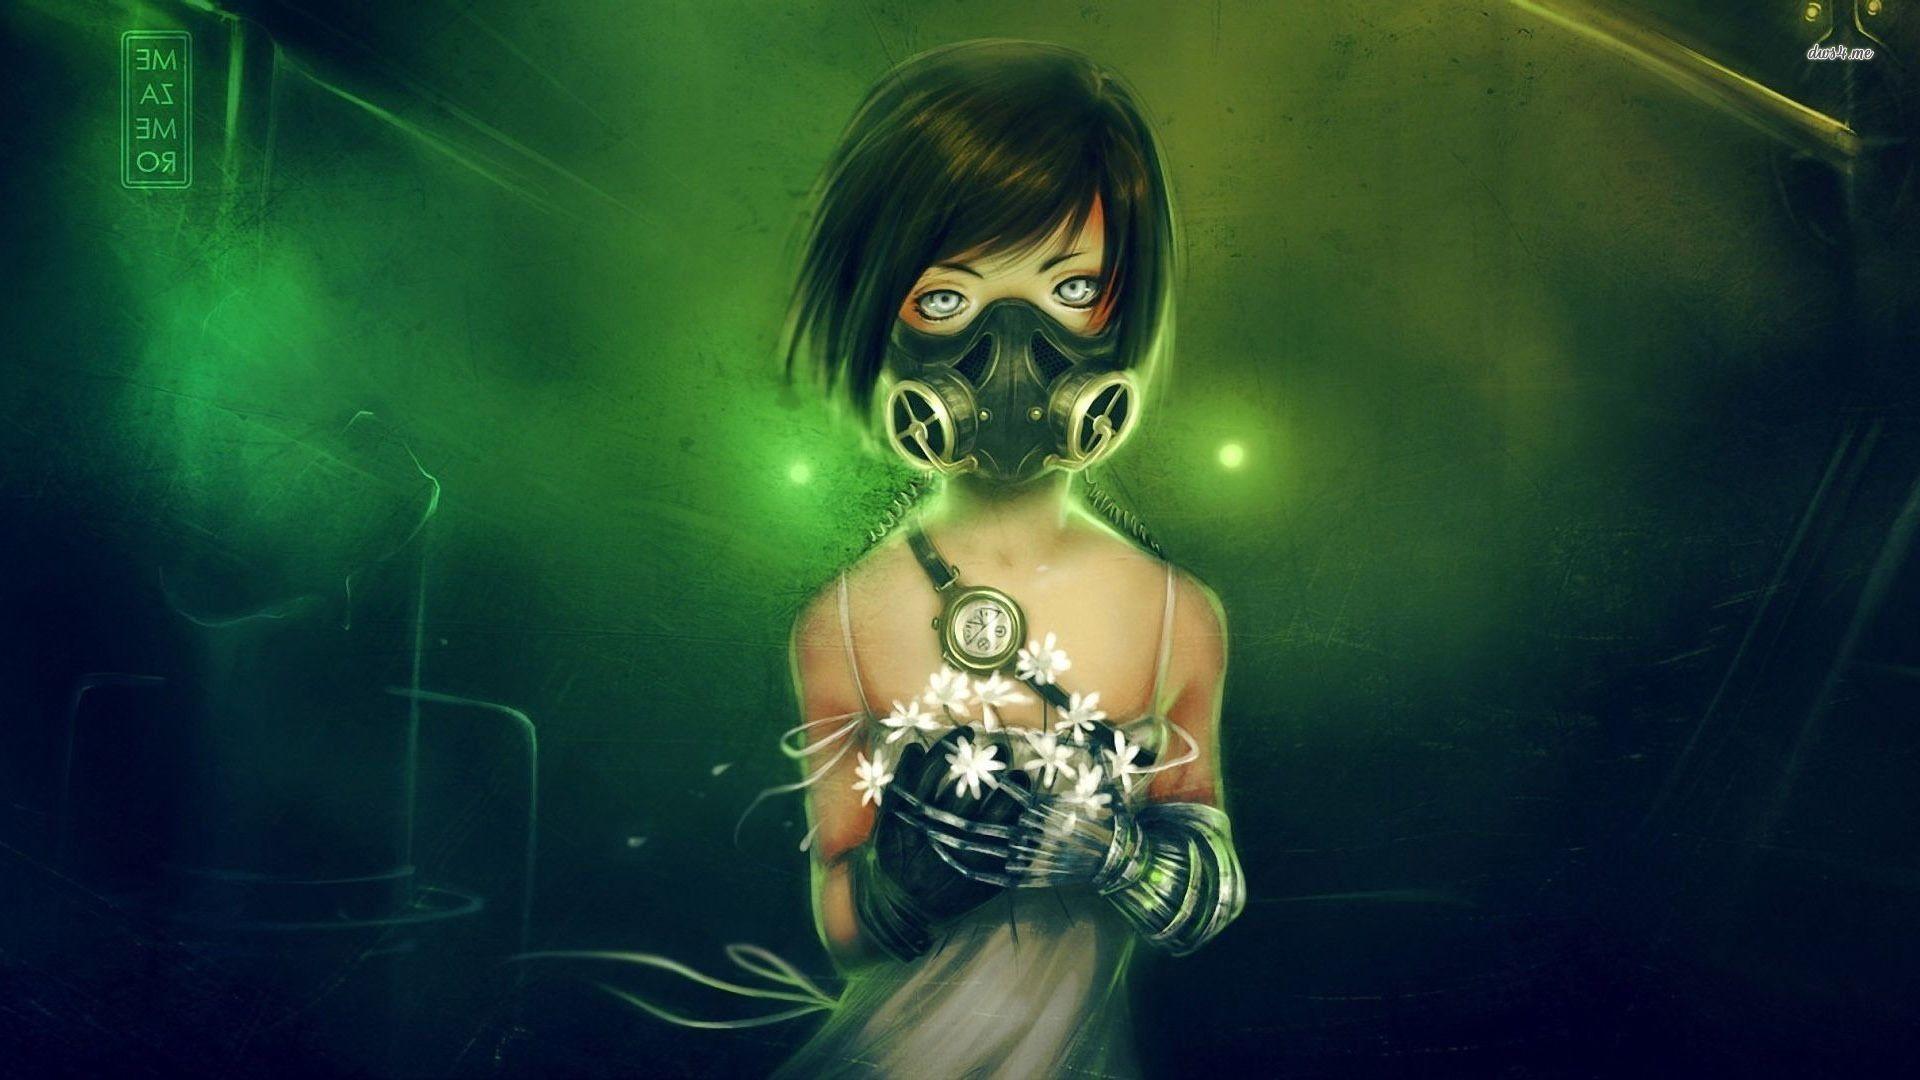 1920x1080, Toxic Girl   Data Id 200953   Data Src /walls/full/2/d/f/200953 - Biohazard Anime Girl - HD Wallpaper